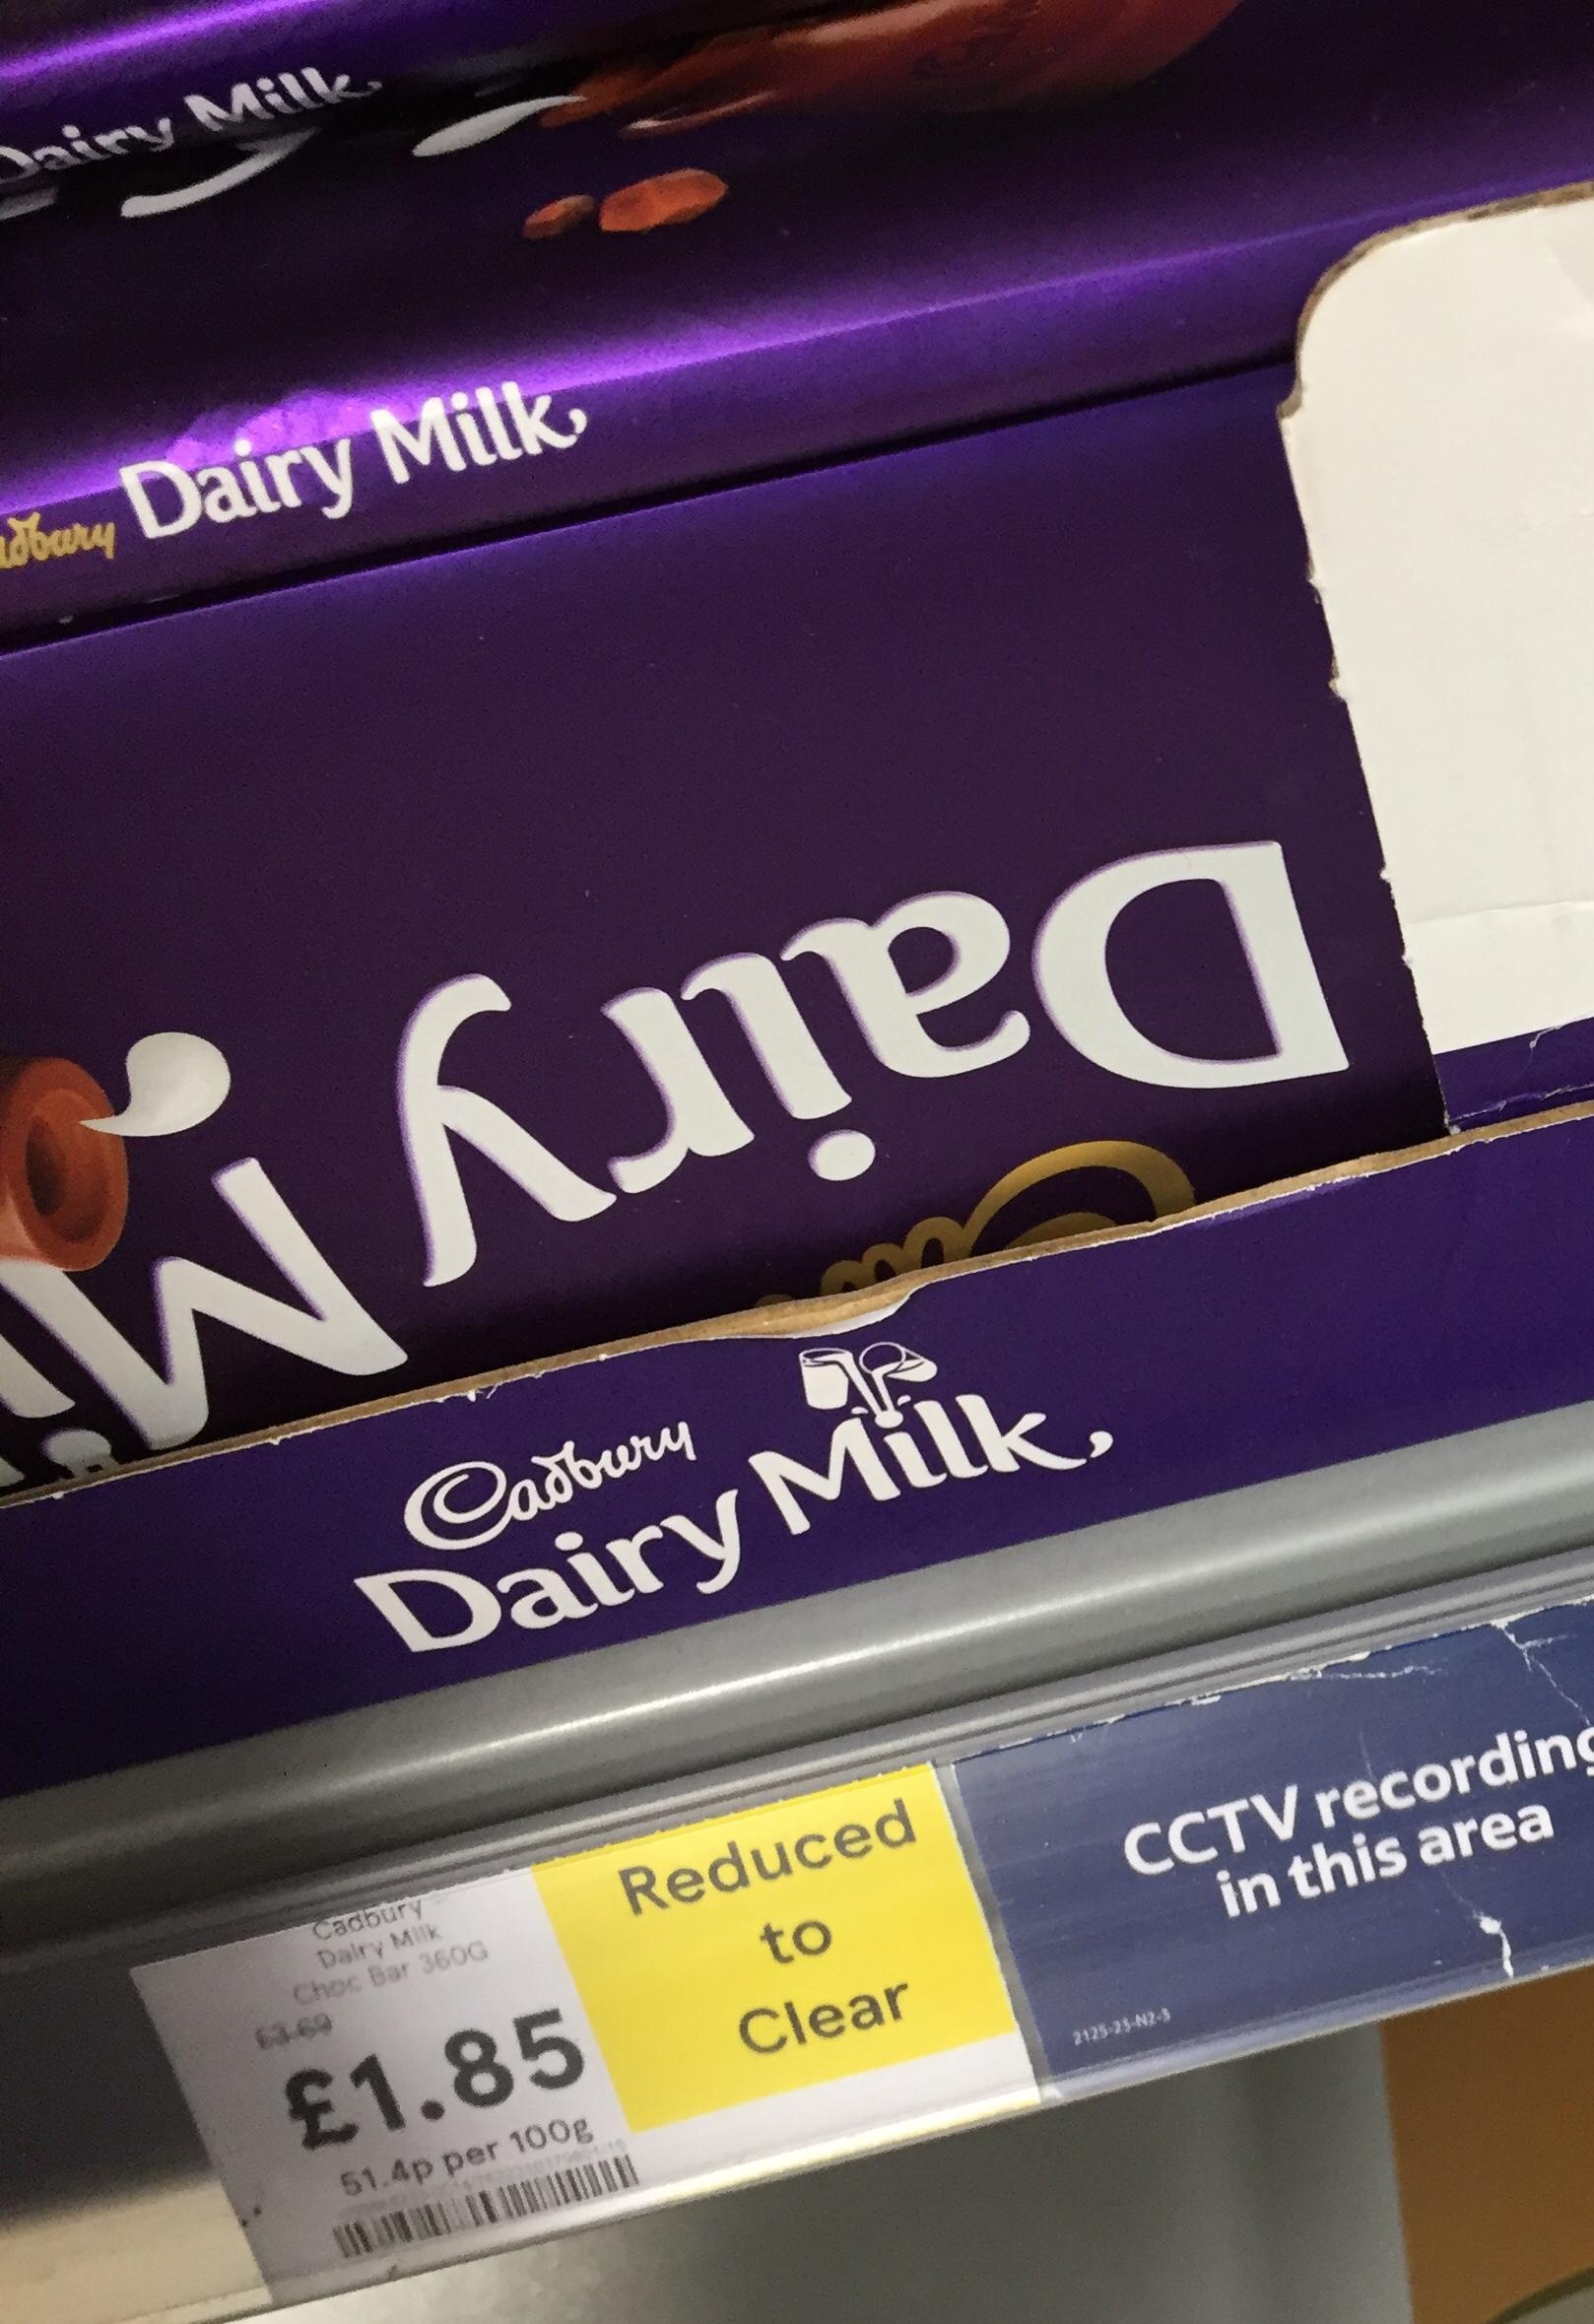 Cadbury Dairy Milk 360g £1.85 @ Tesco